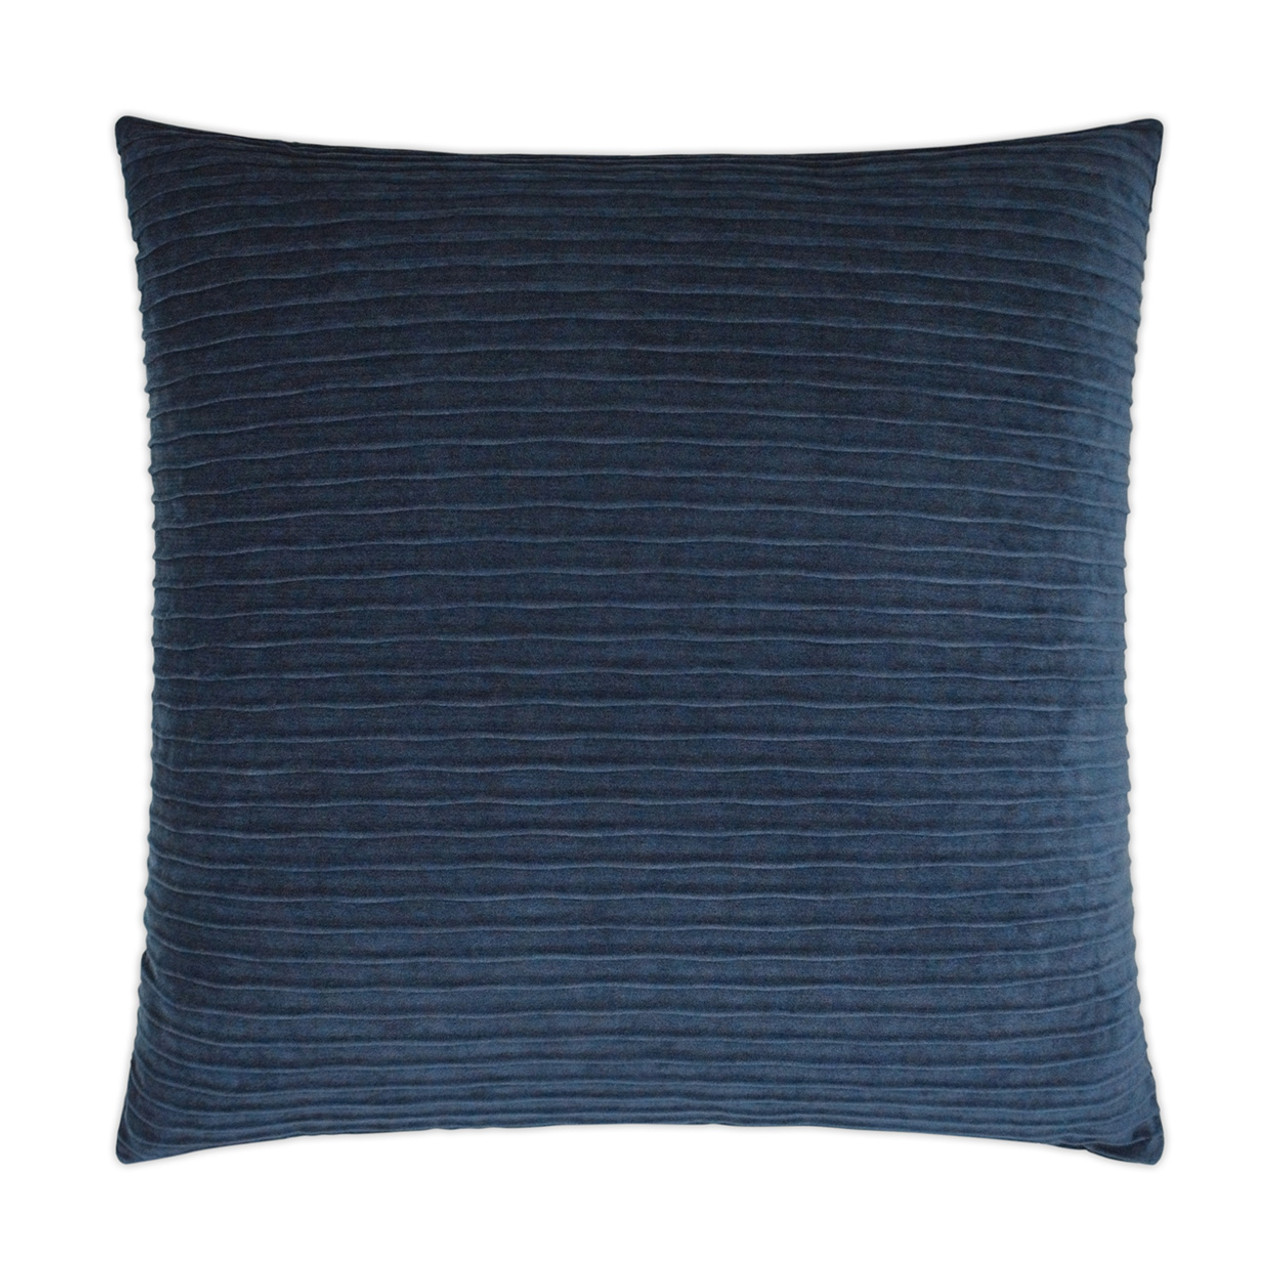 Pleatte Throw Pillow - Navy Blue